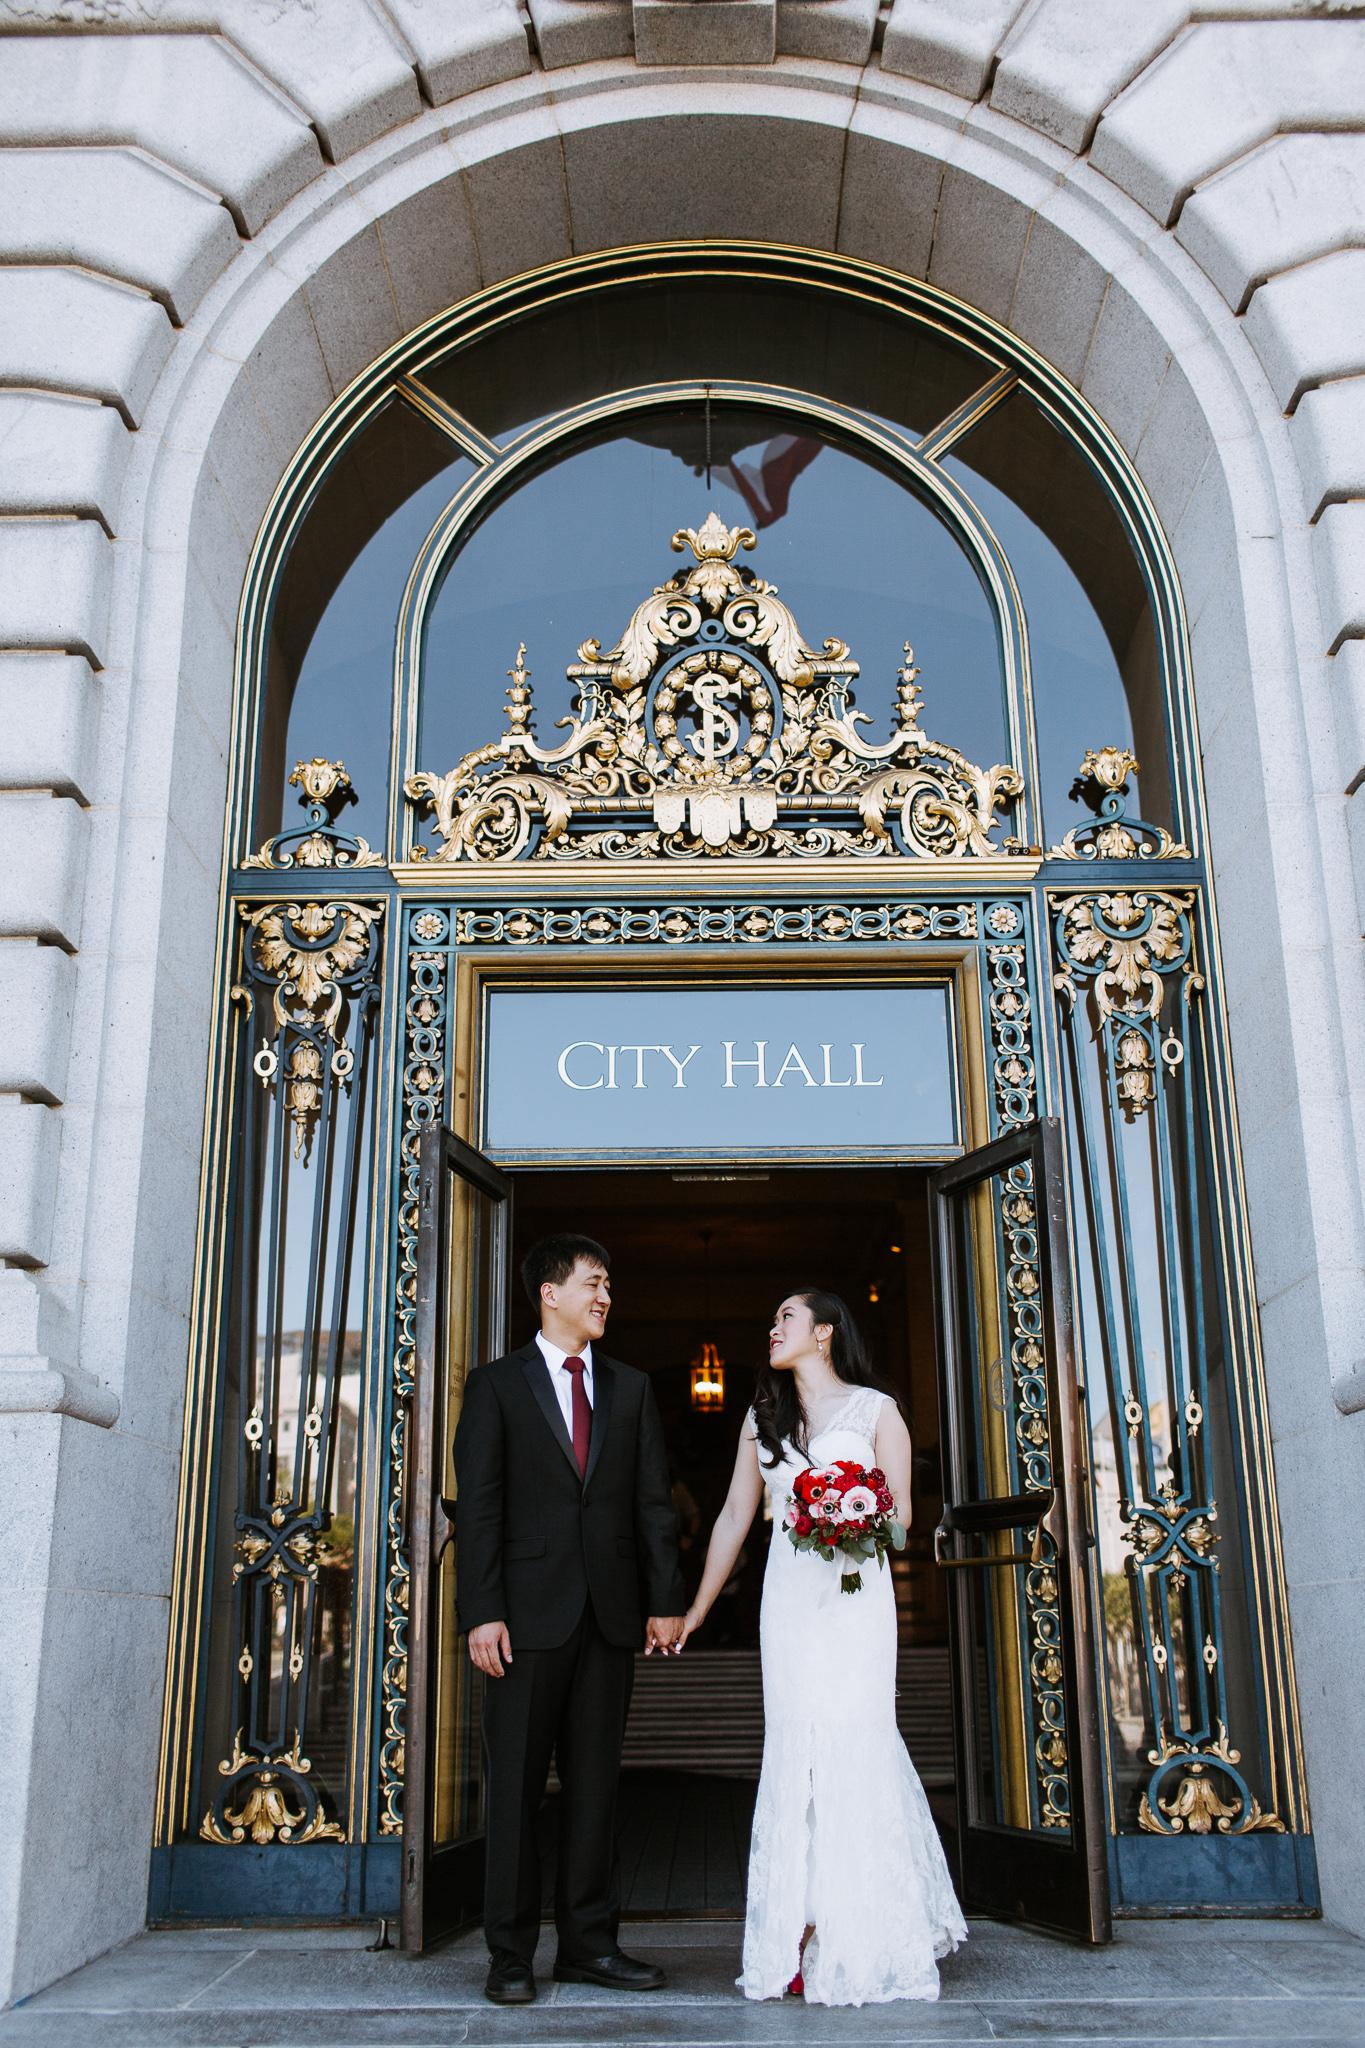 SanFrancisco-City-Hall-Elopement-41.jpg